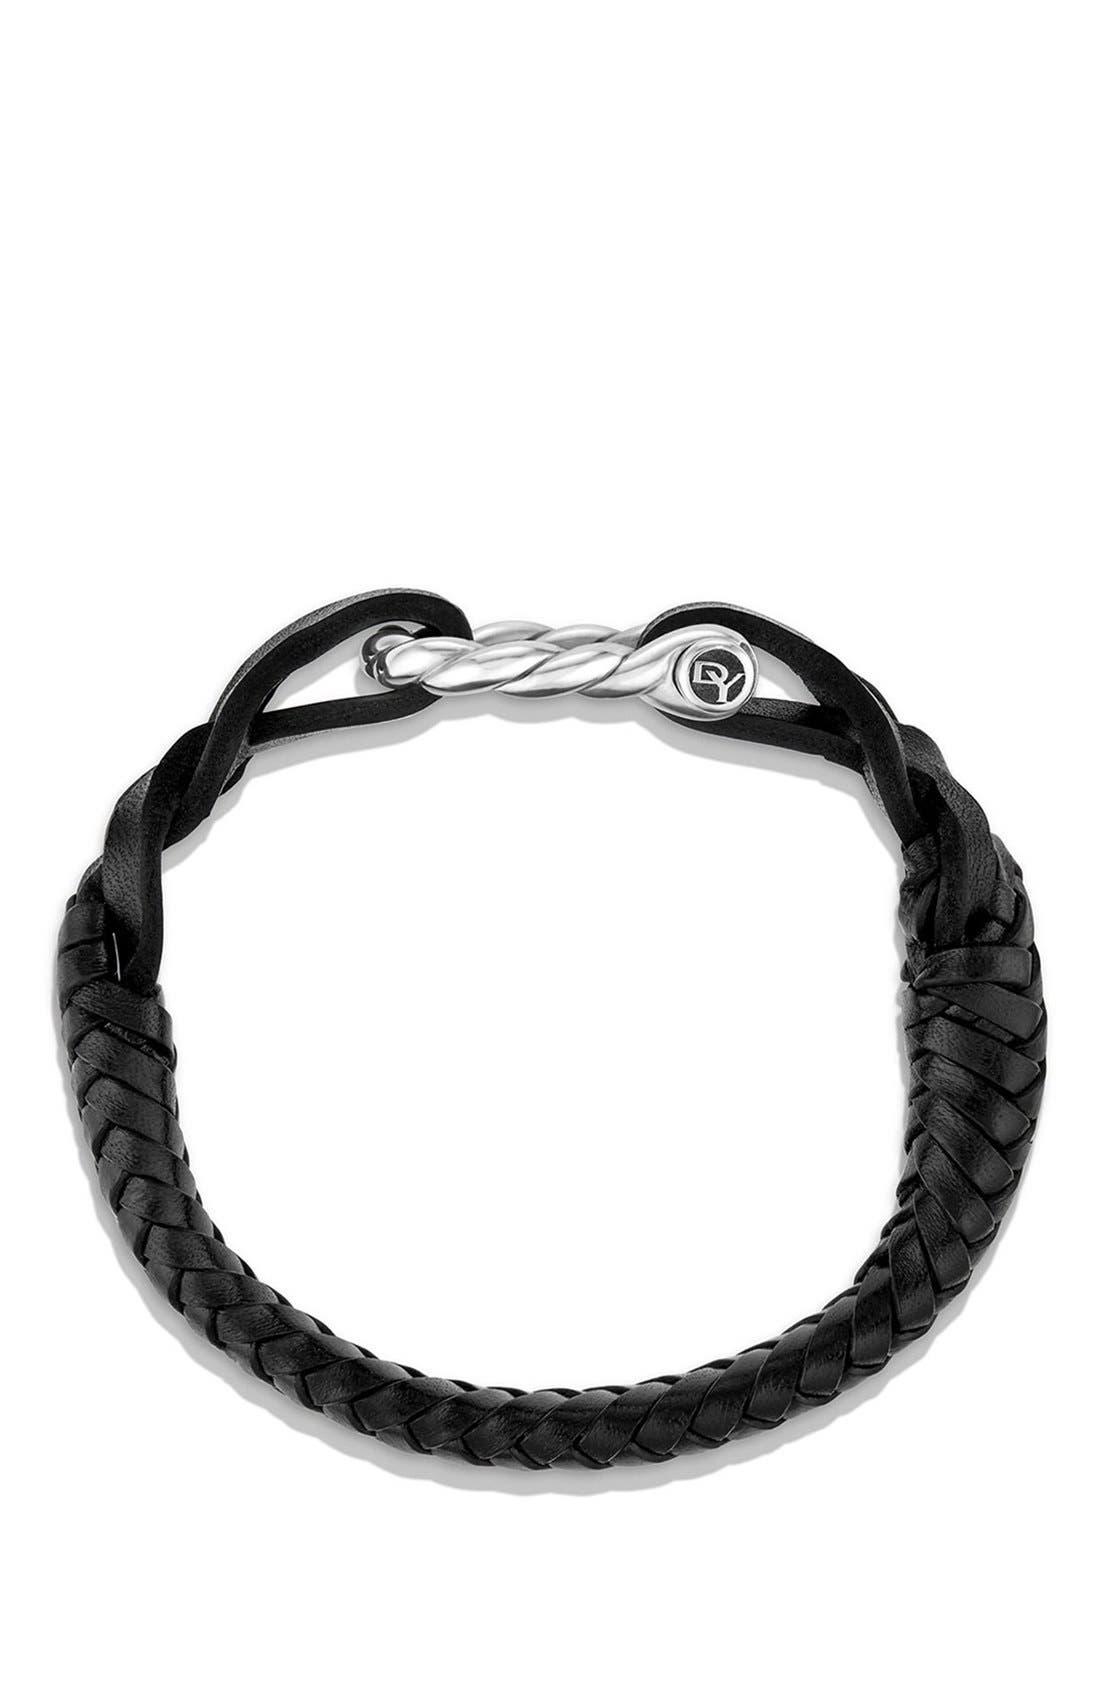 Alternate Image 2  - David Yurman 'Maritime' Leather Woven Shackle Bracelet